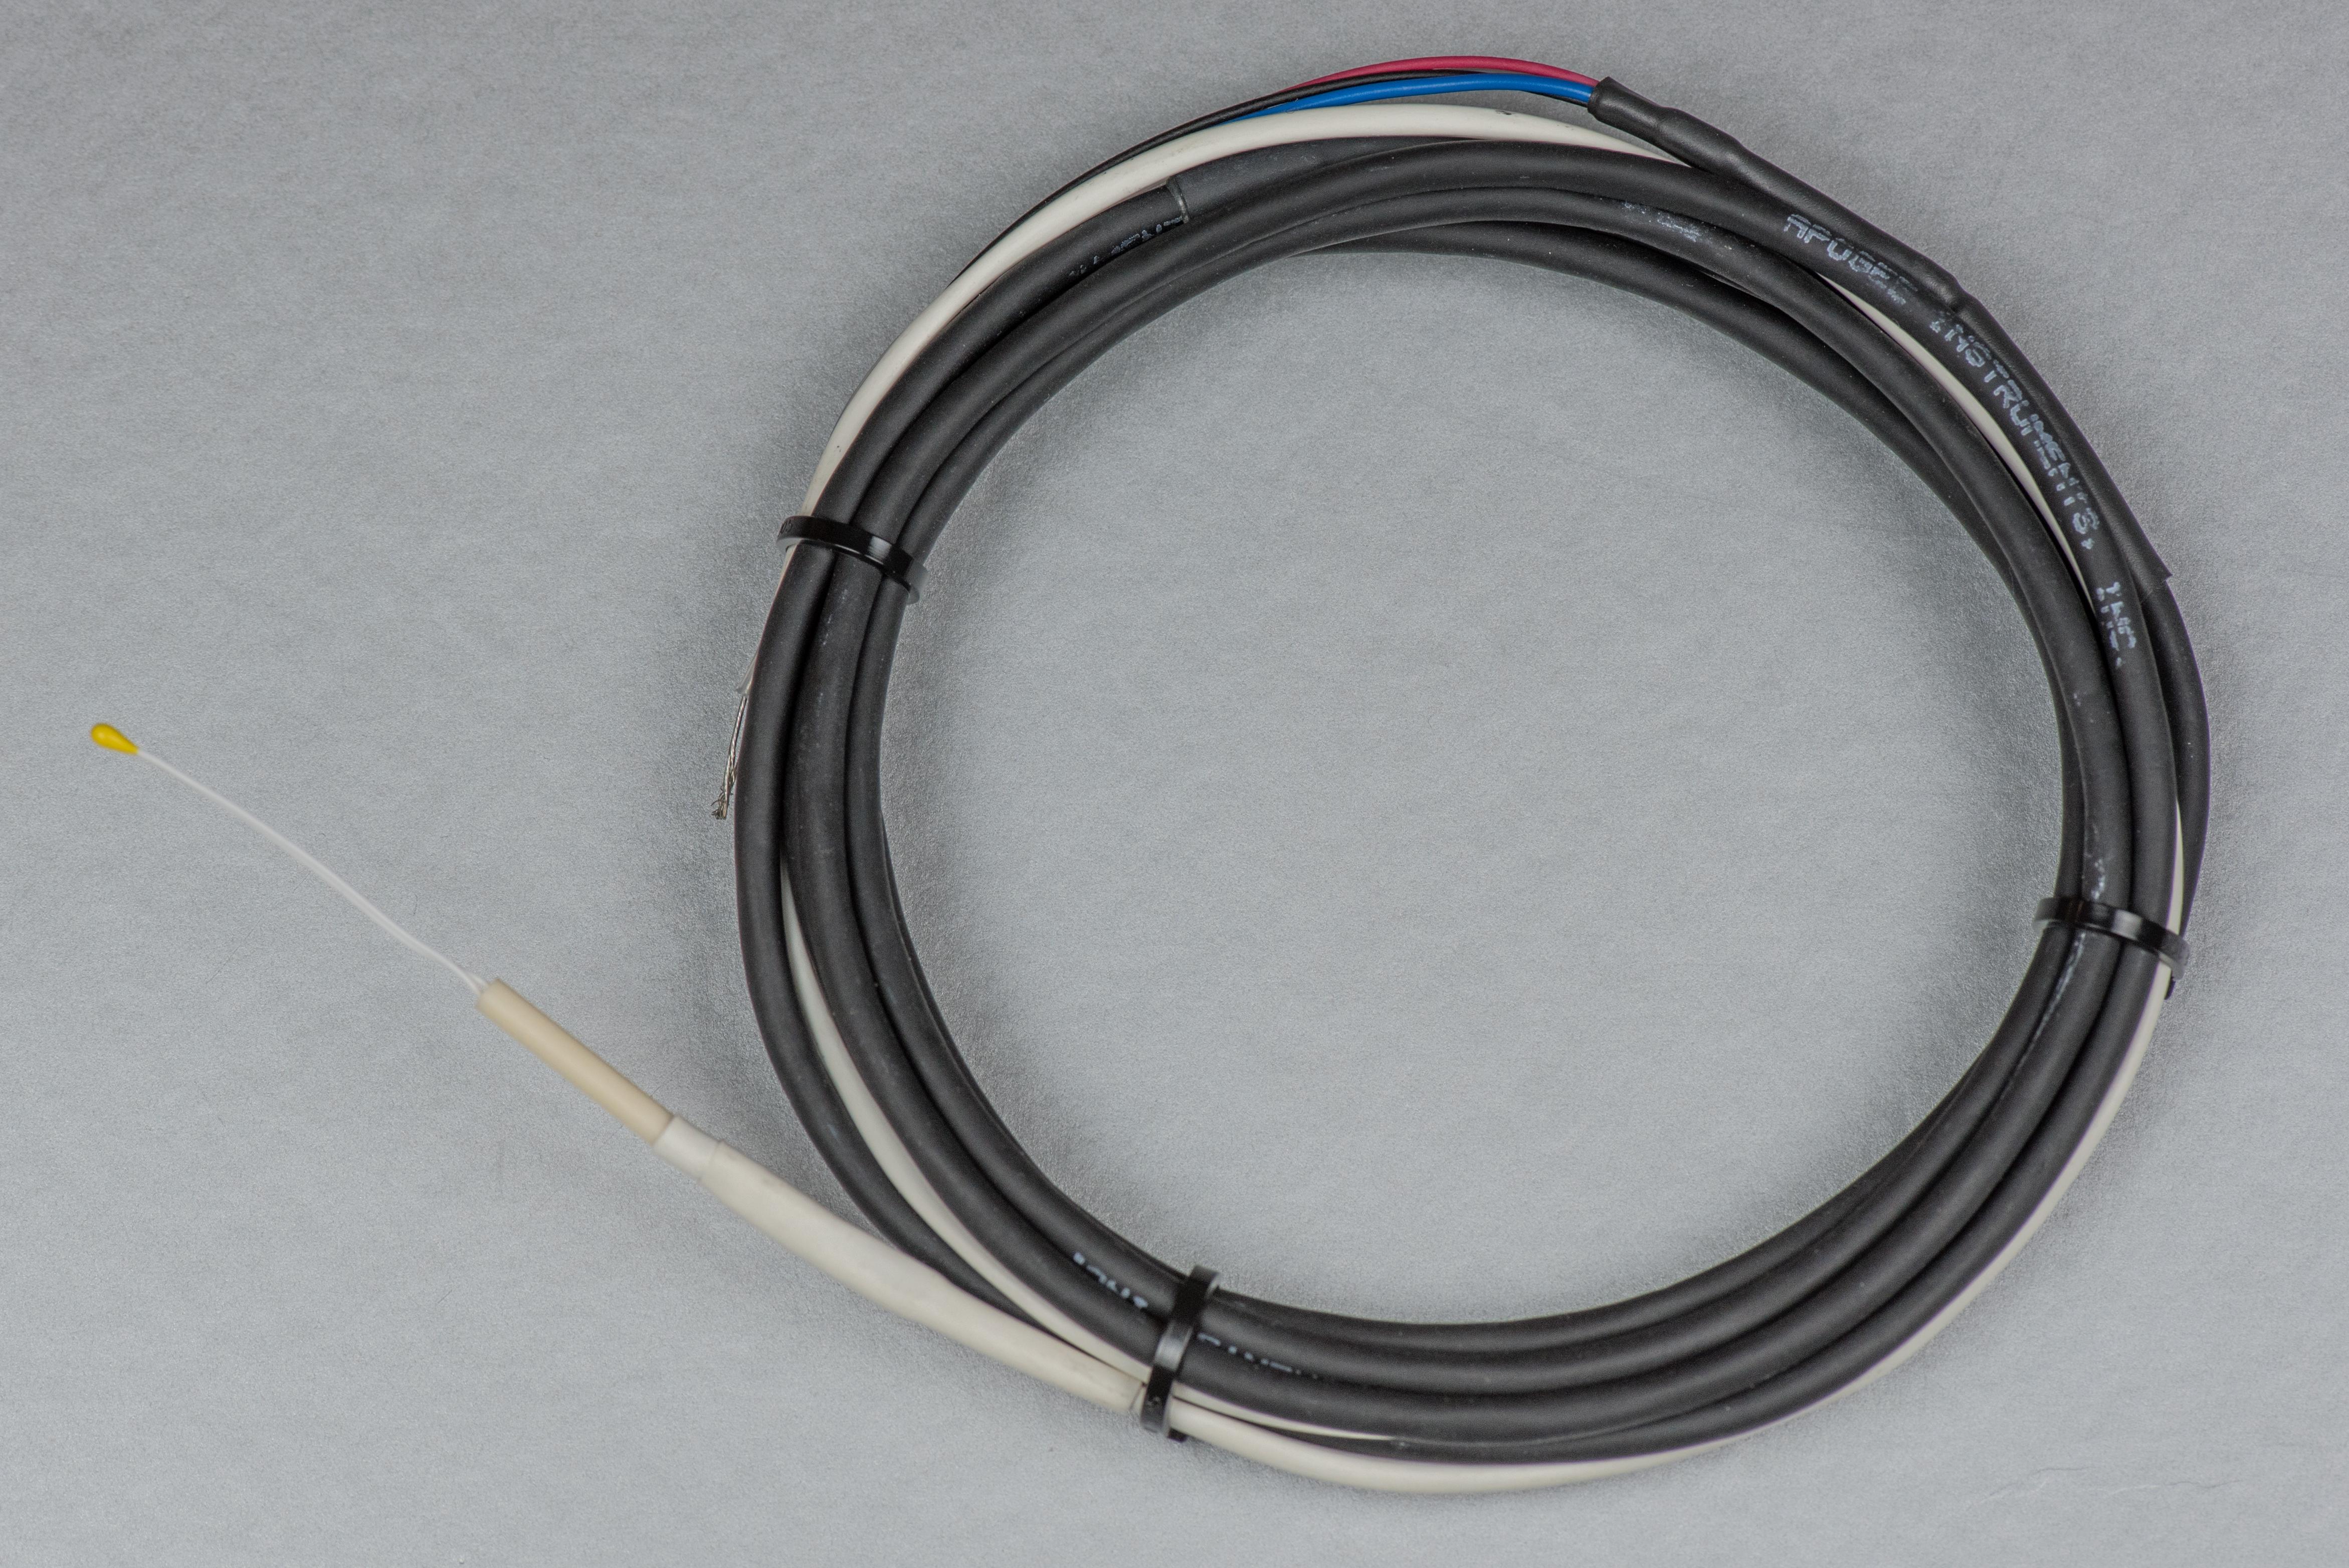 ST-110 thermistor